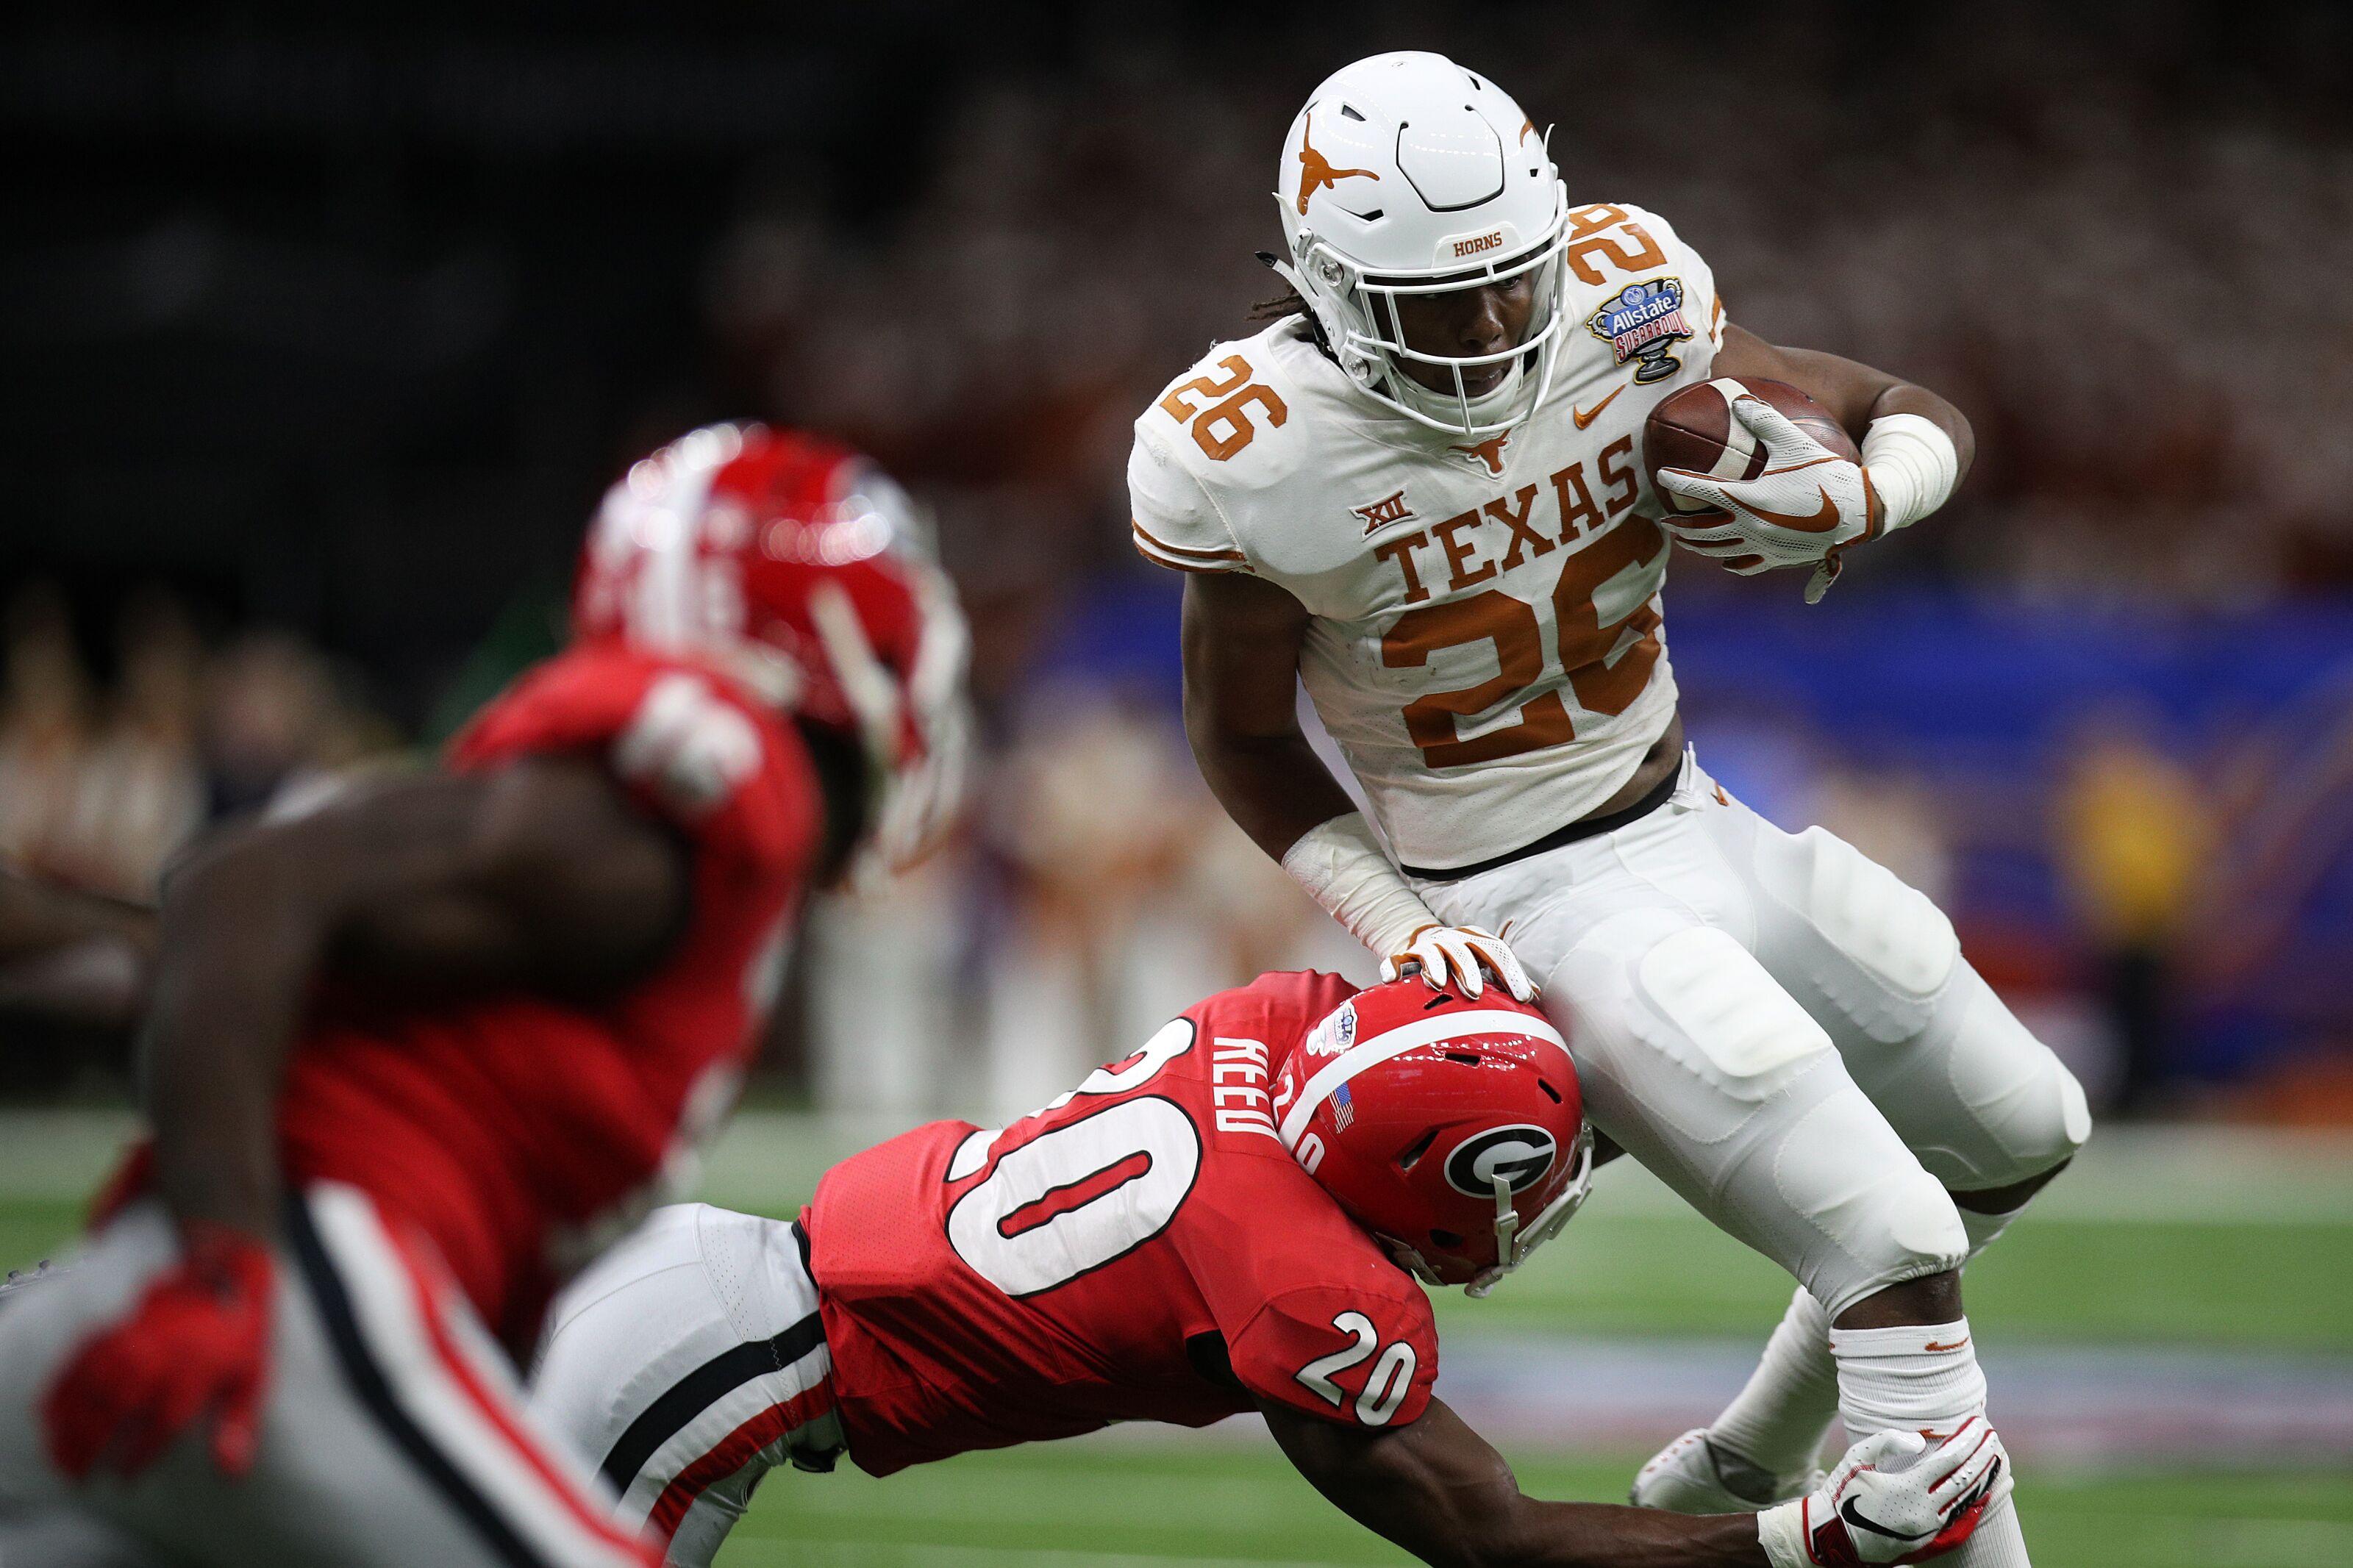 Texas Football: Keaontay Ingram makes Doak Walker Award Watch List